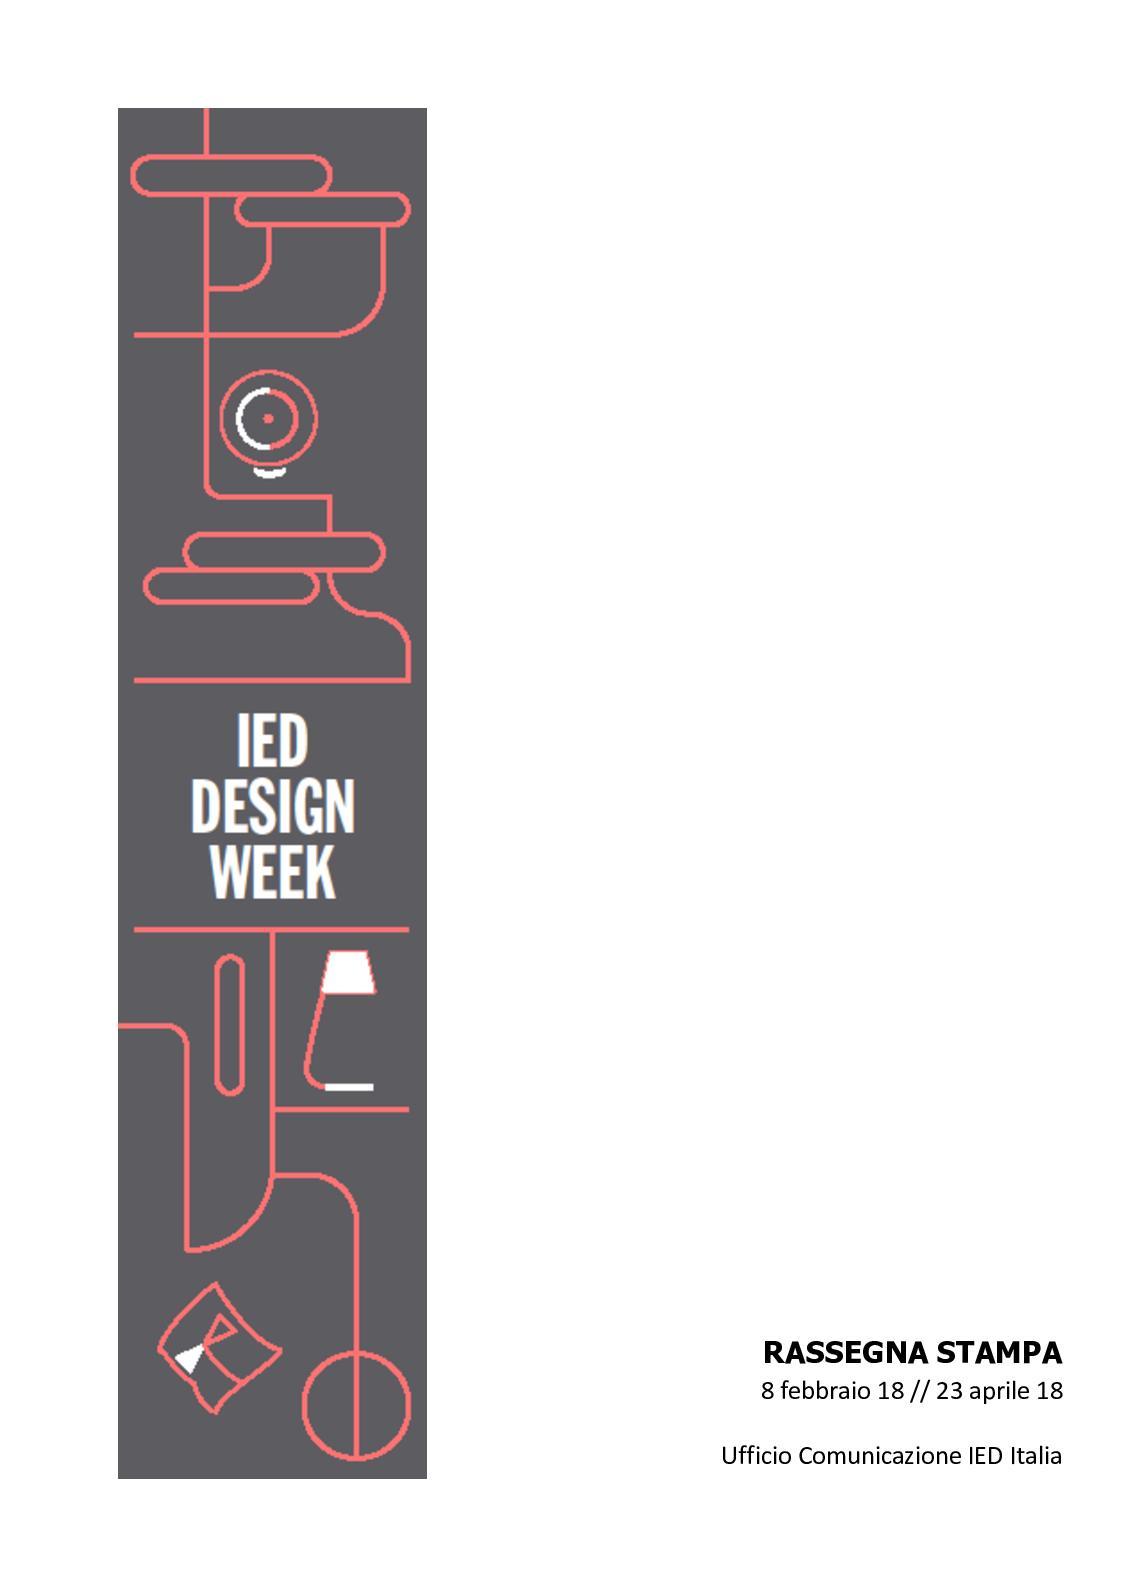 Calaméo Rassegna Stampa Ied Design Week